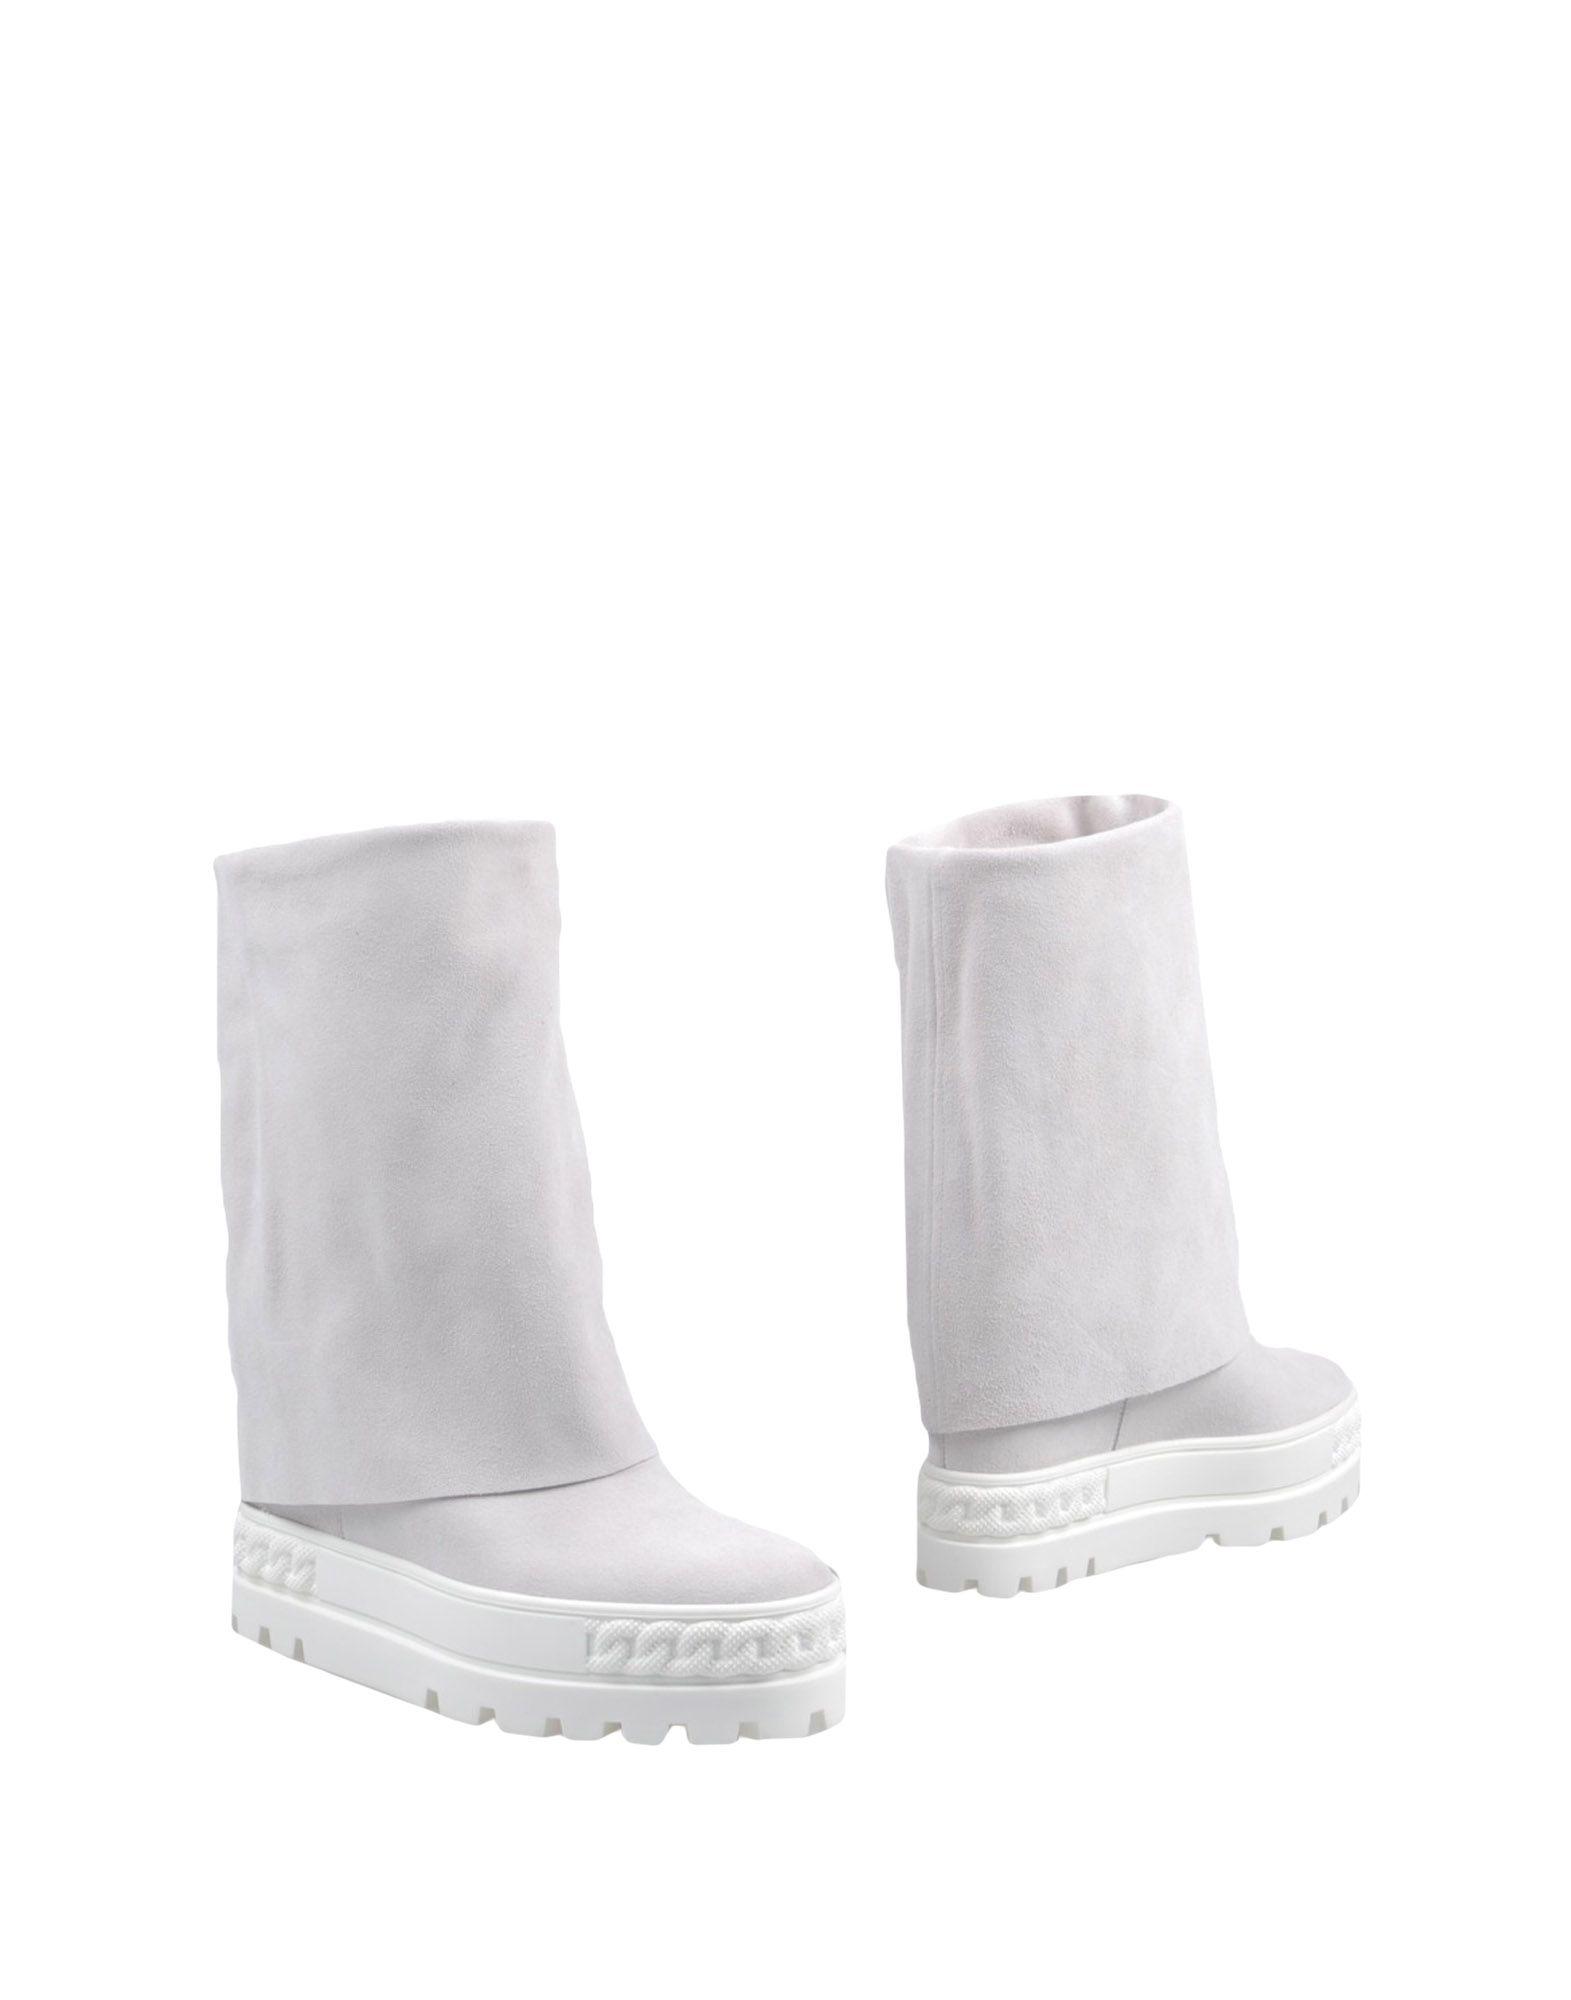 Rabatt Schuhe Casadei Stiefelette Damen  11451310IK